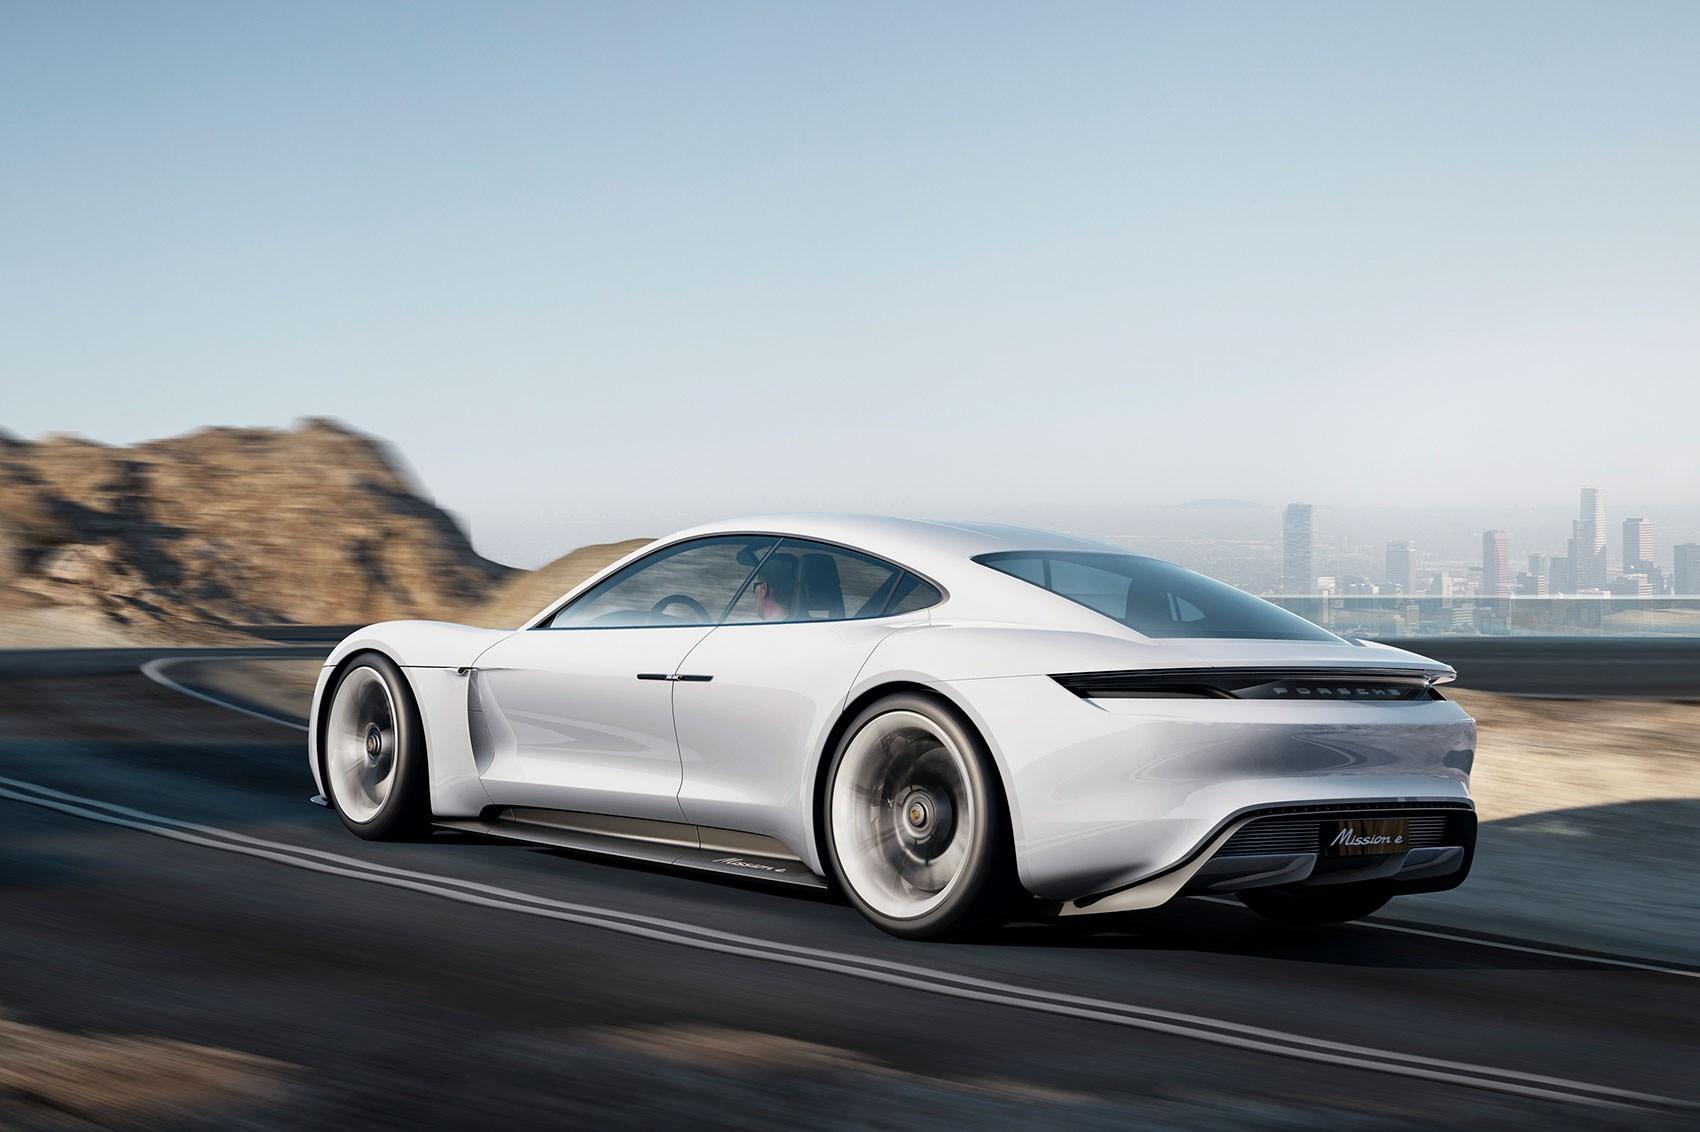 Porsche Taycan Performance Model To Get Turbo Badge